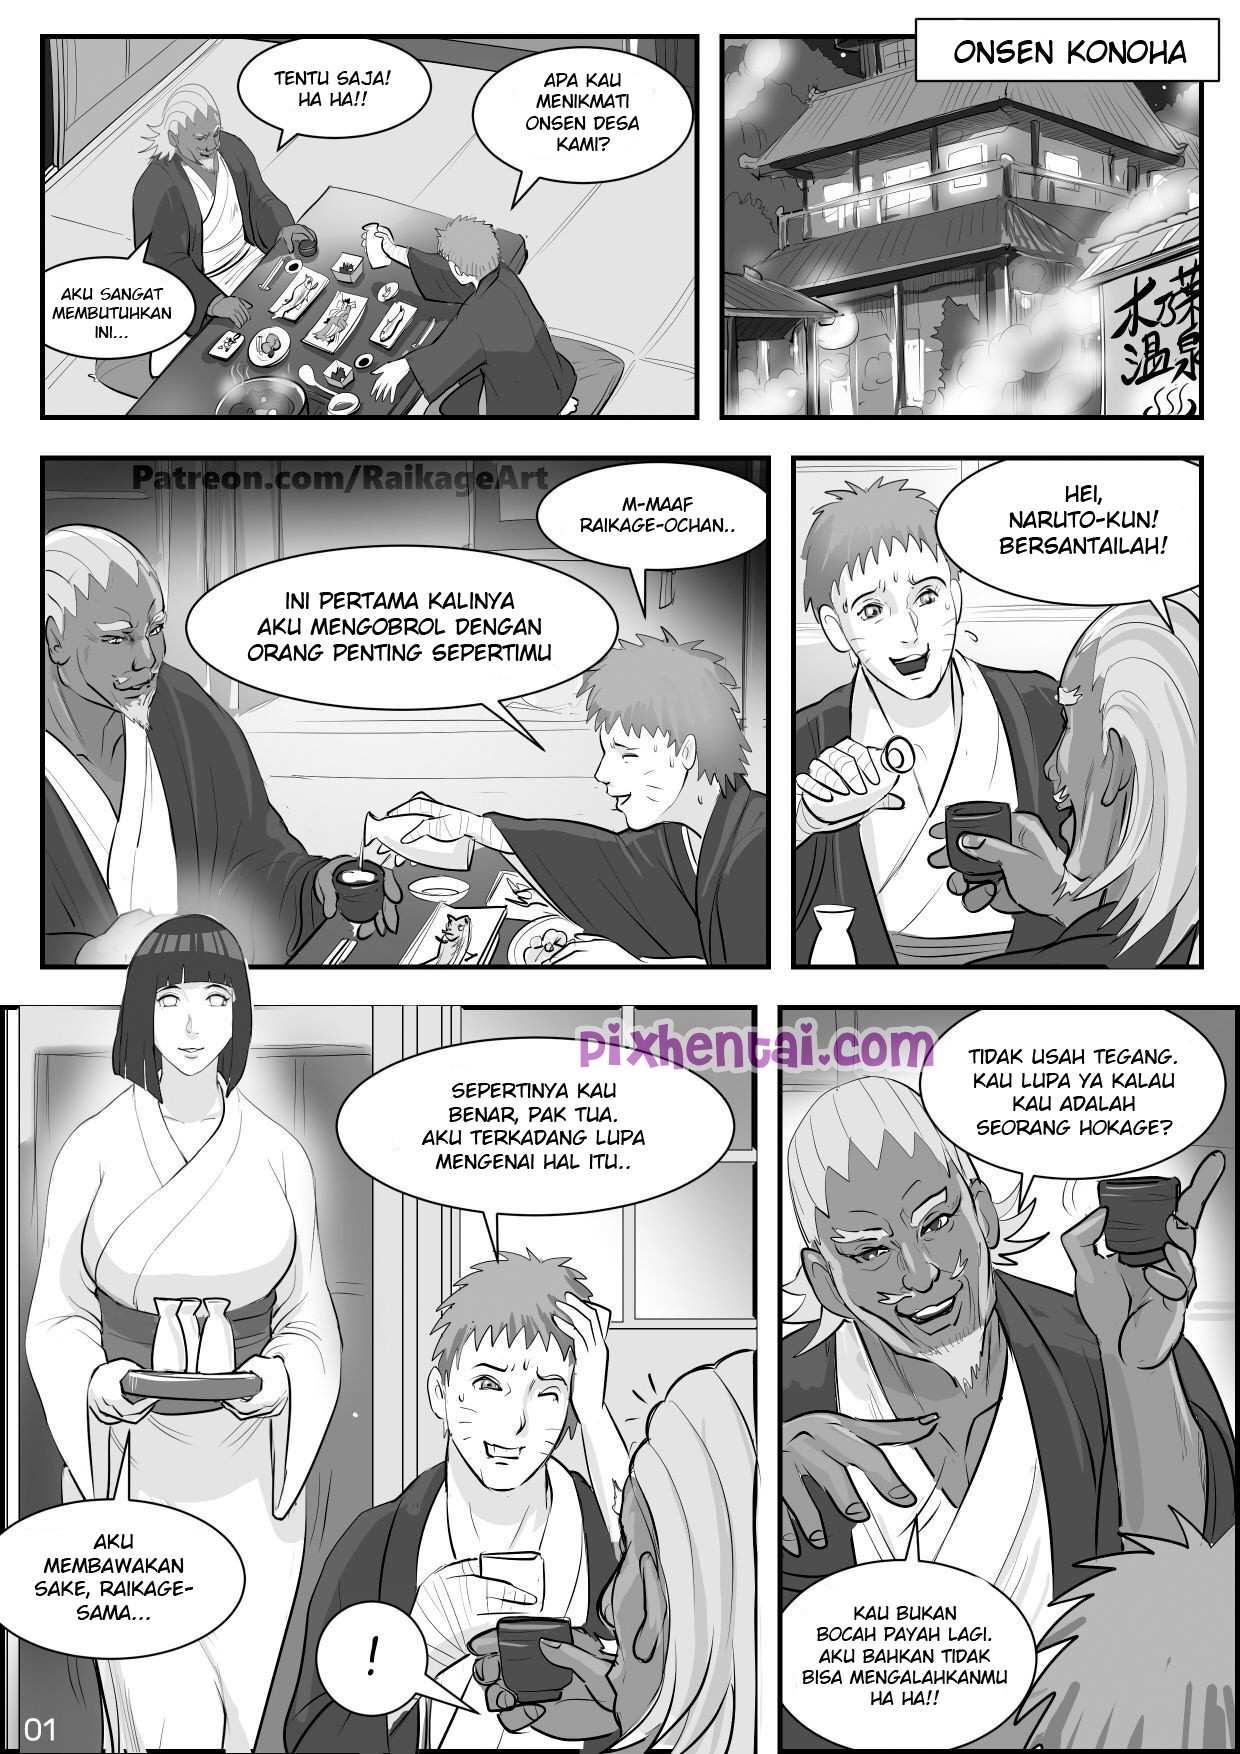 Komik hentai xxx manga sex bokep hinata dientot penis besar raikage 04